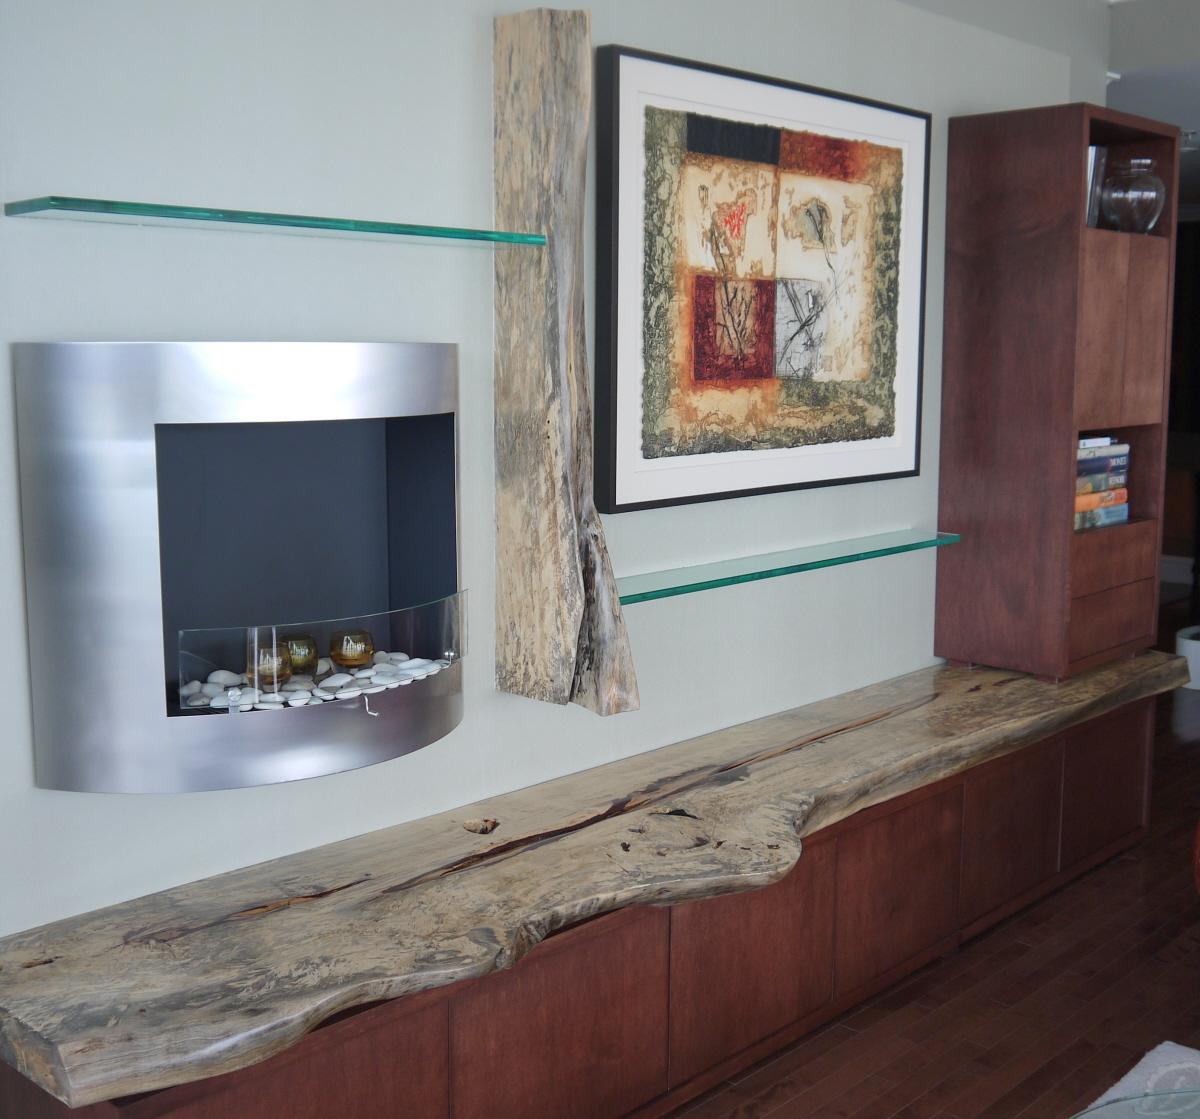 Bibliotheque etagere bois exotique organique Tamarin